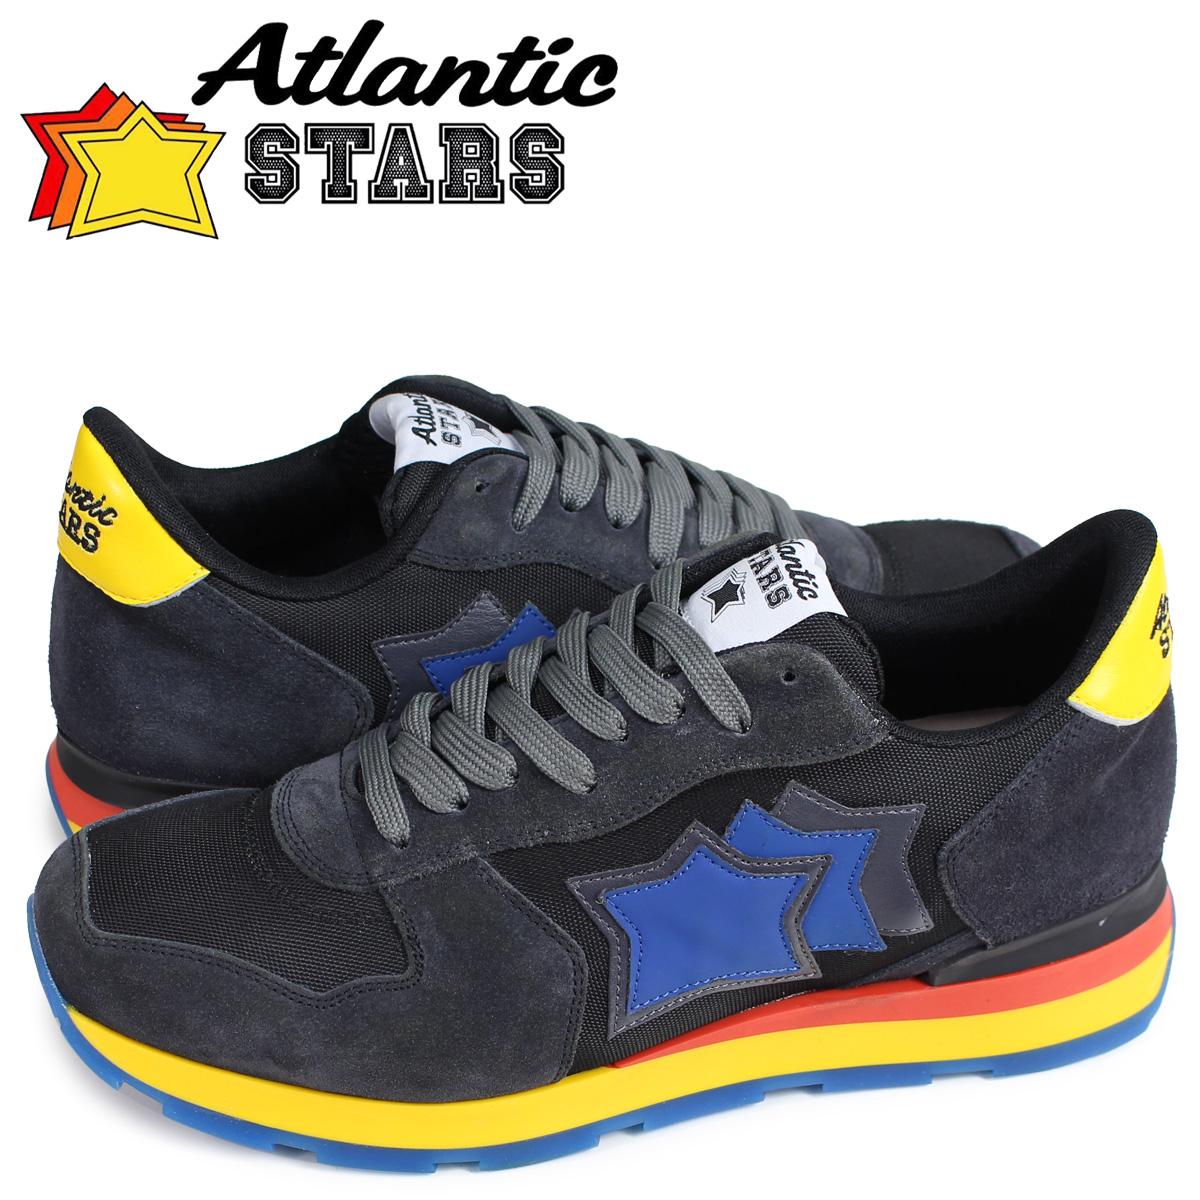 Atlantic STARS ANTARES アトランティックスターズ アンタレス スニーカー メンズ ネイビー ANG-49N